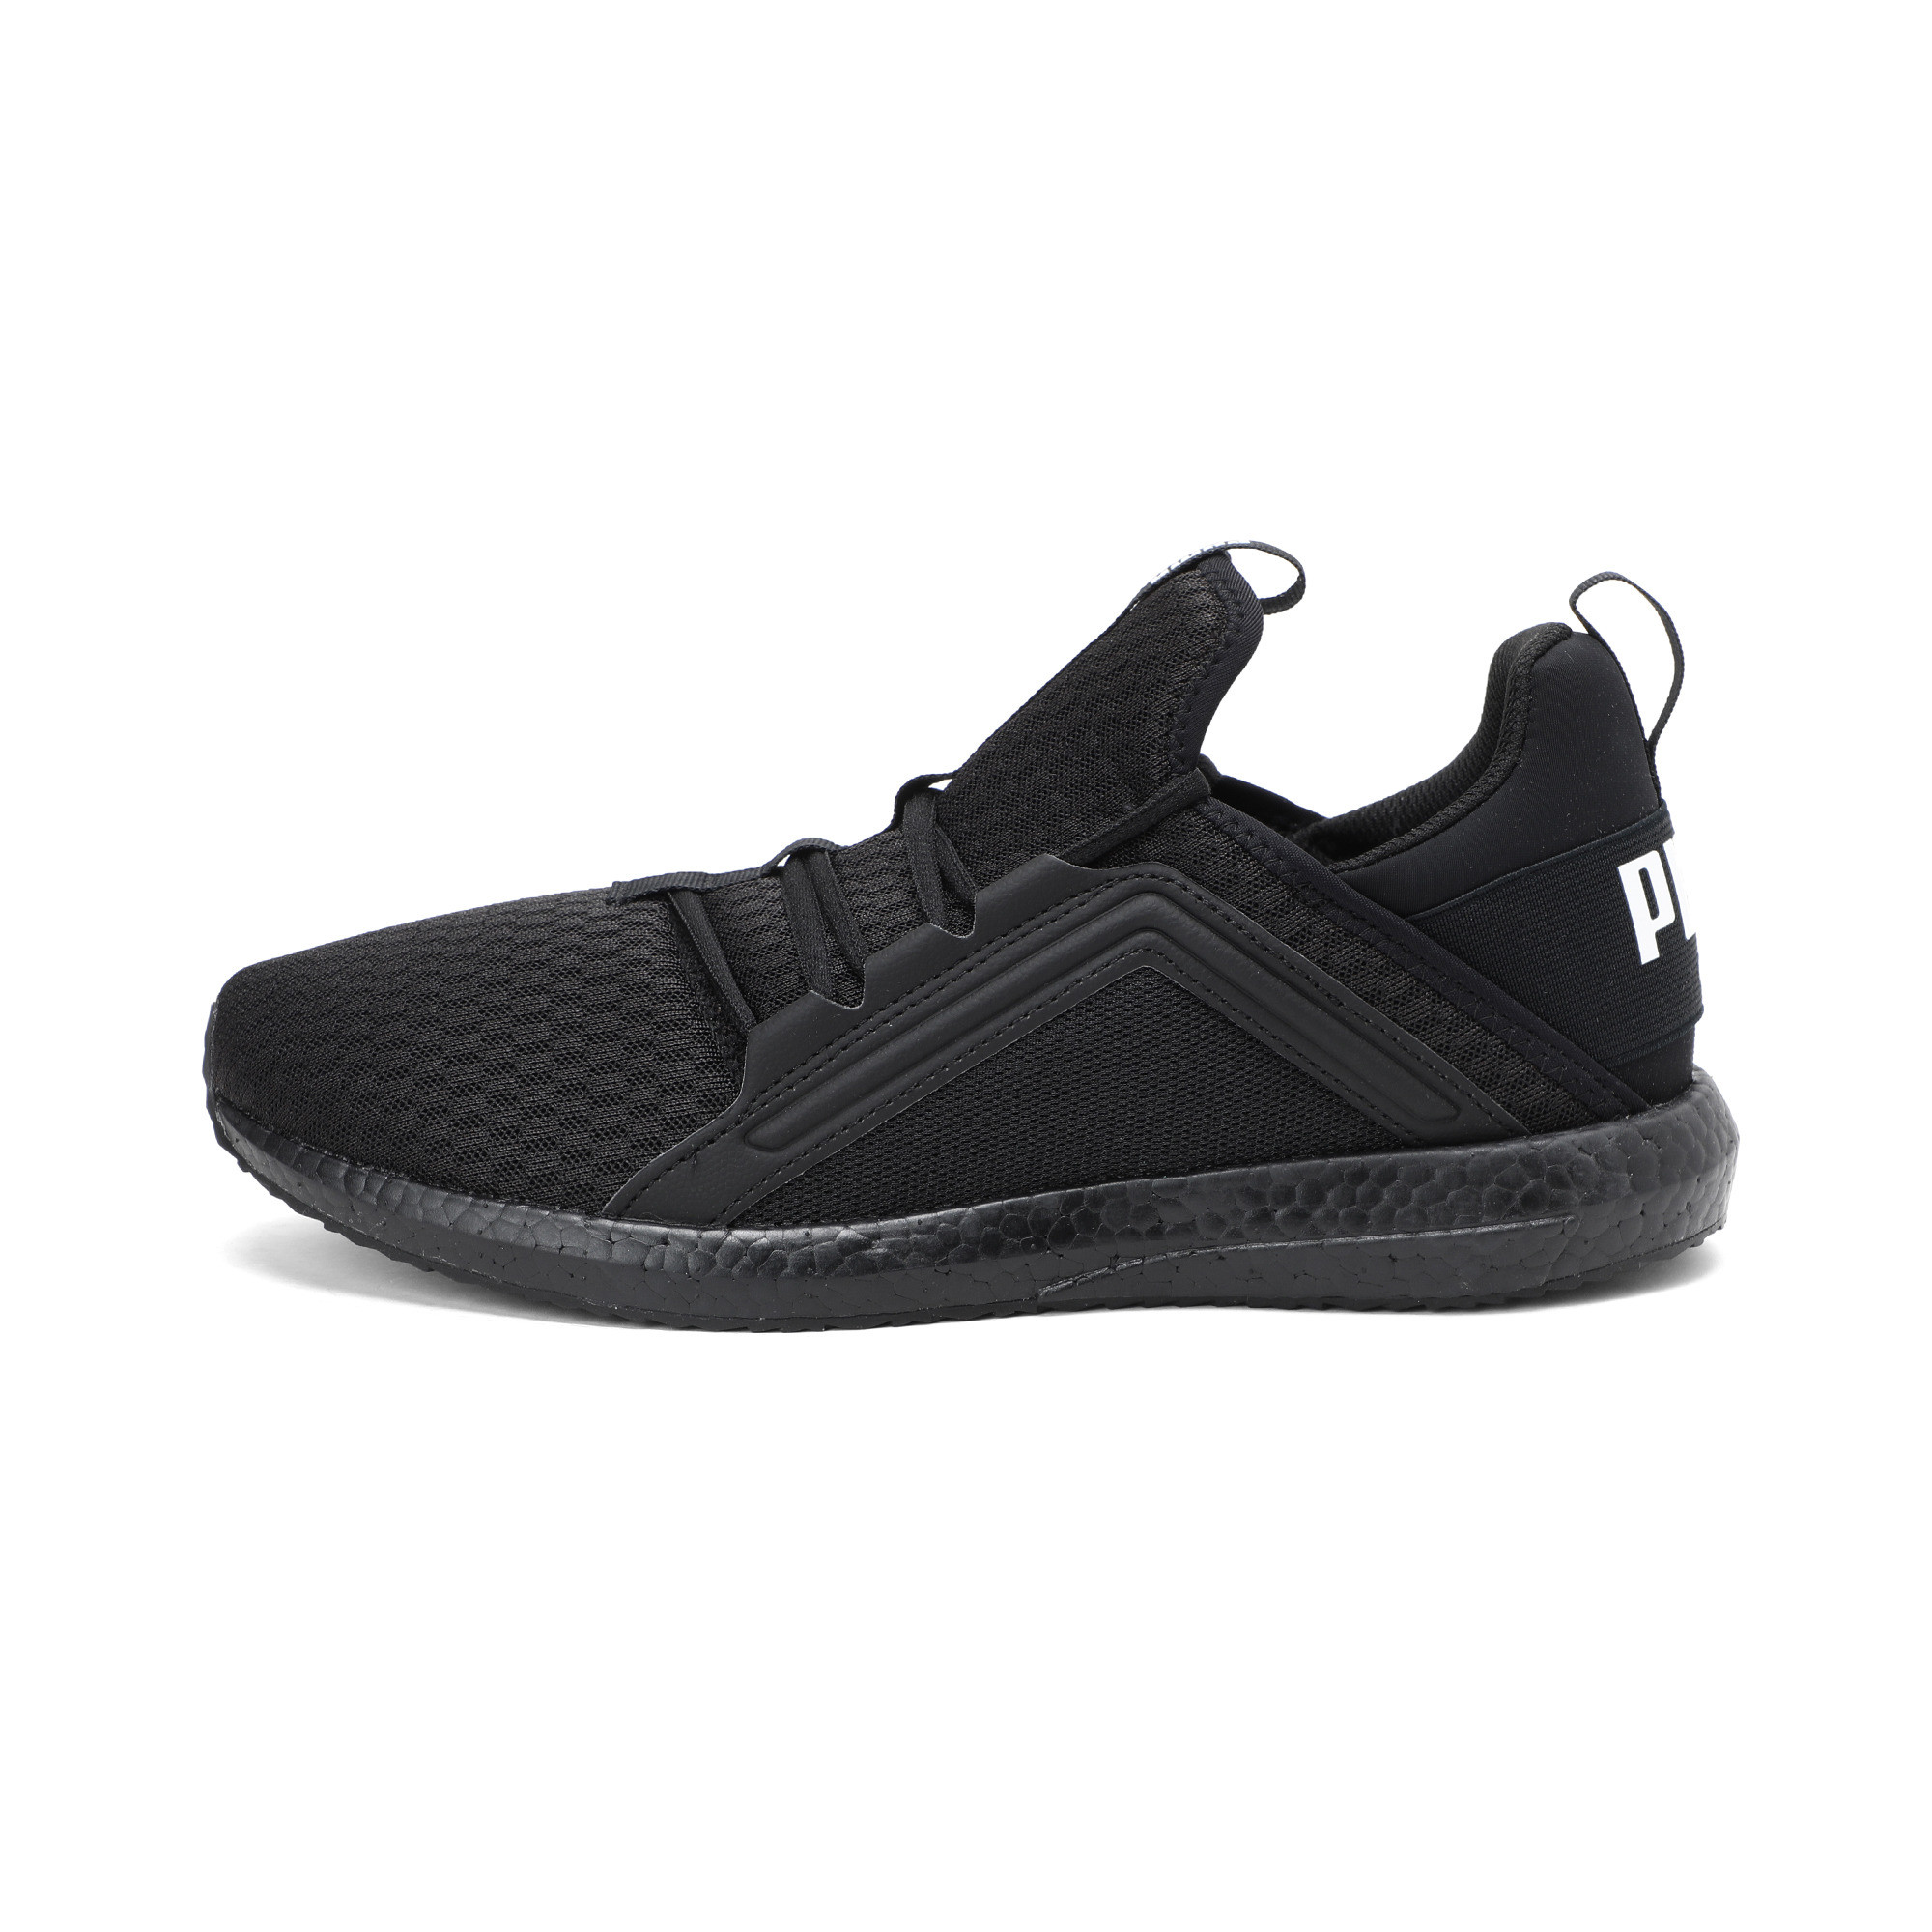 Details zu PUMA Mega NRGY Herren Sneaker Männer Schuhe Laufen Neu